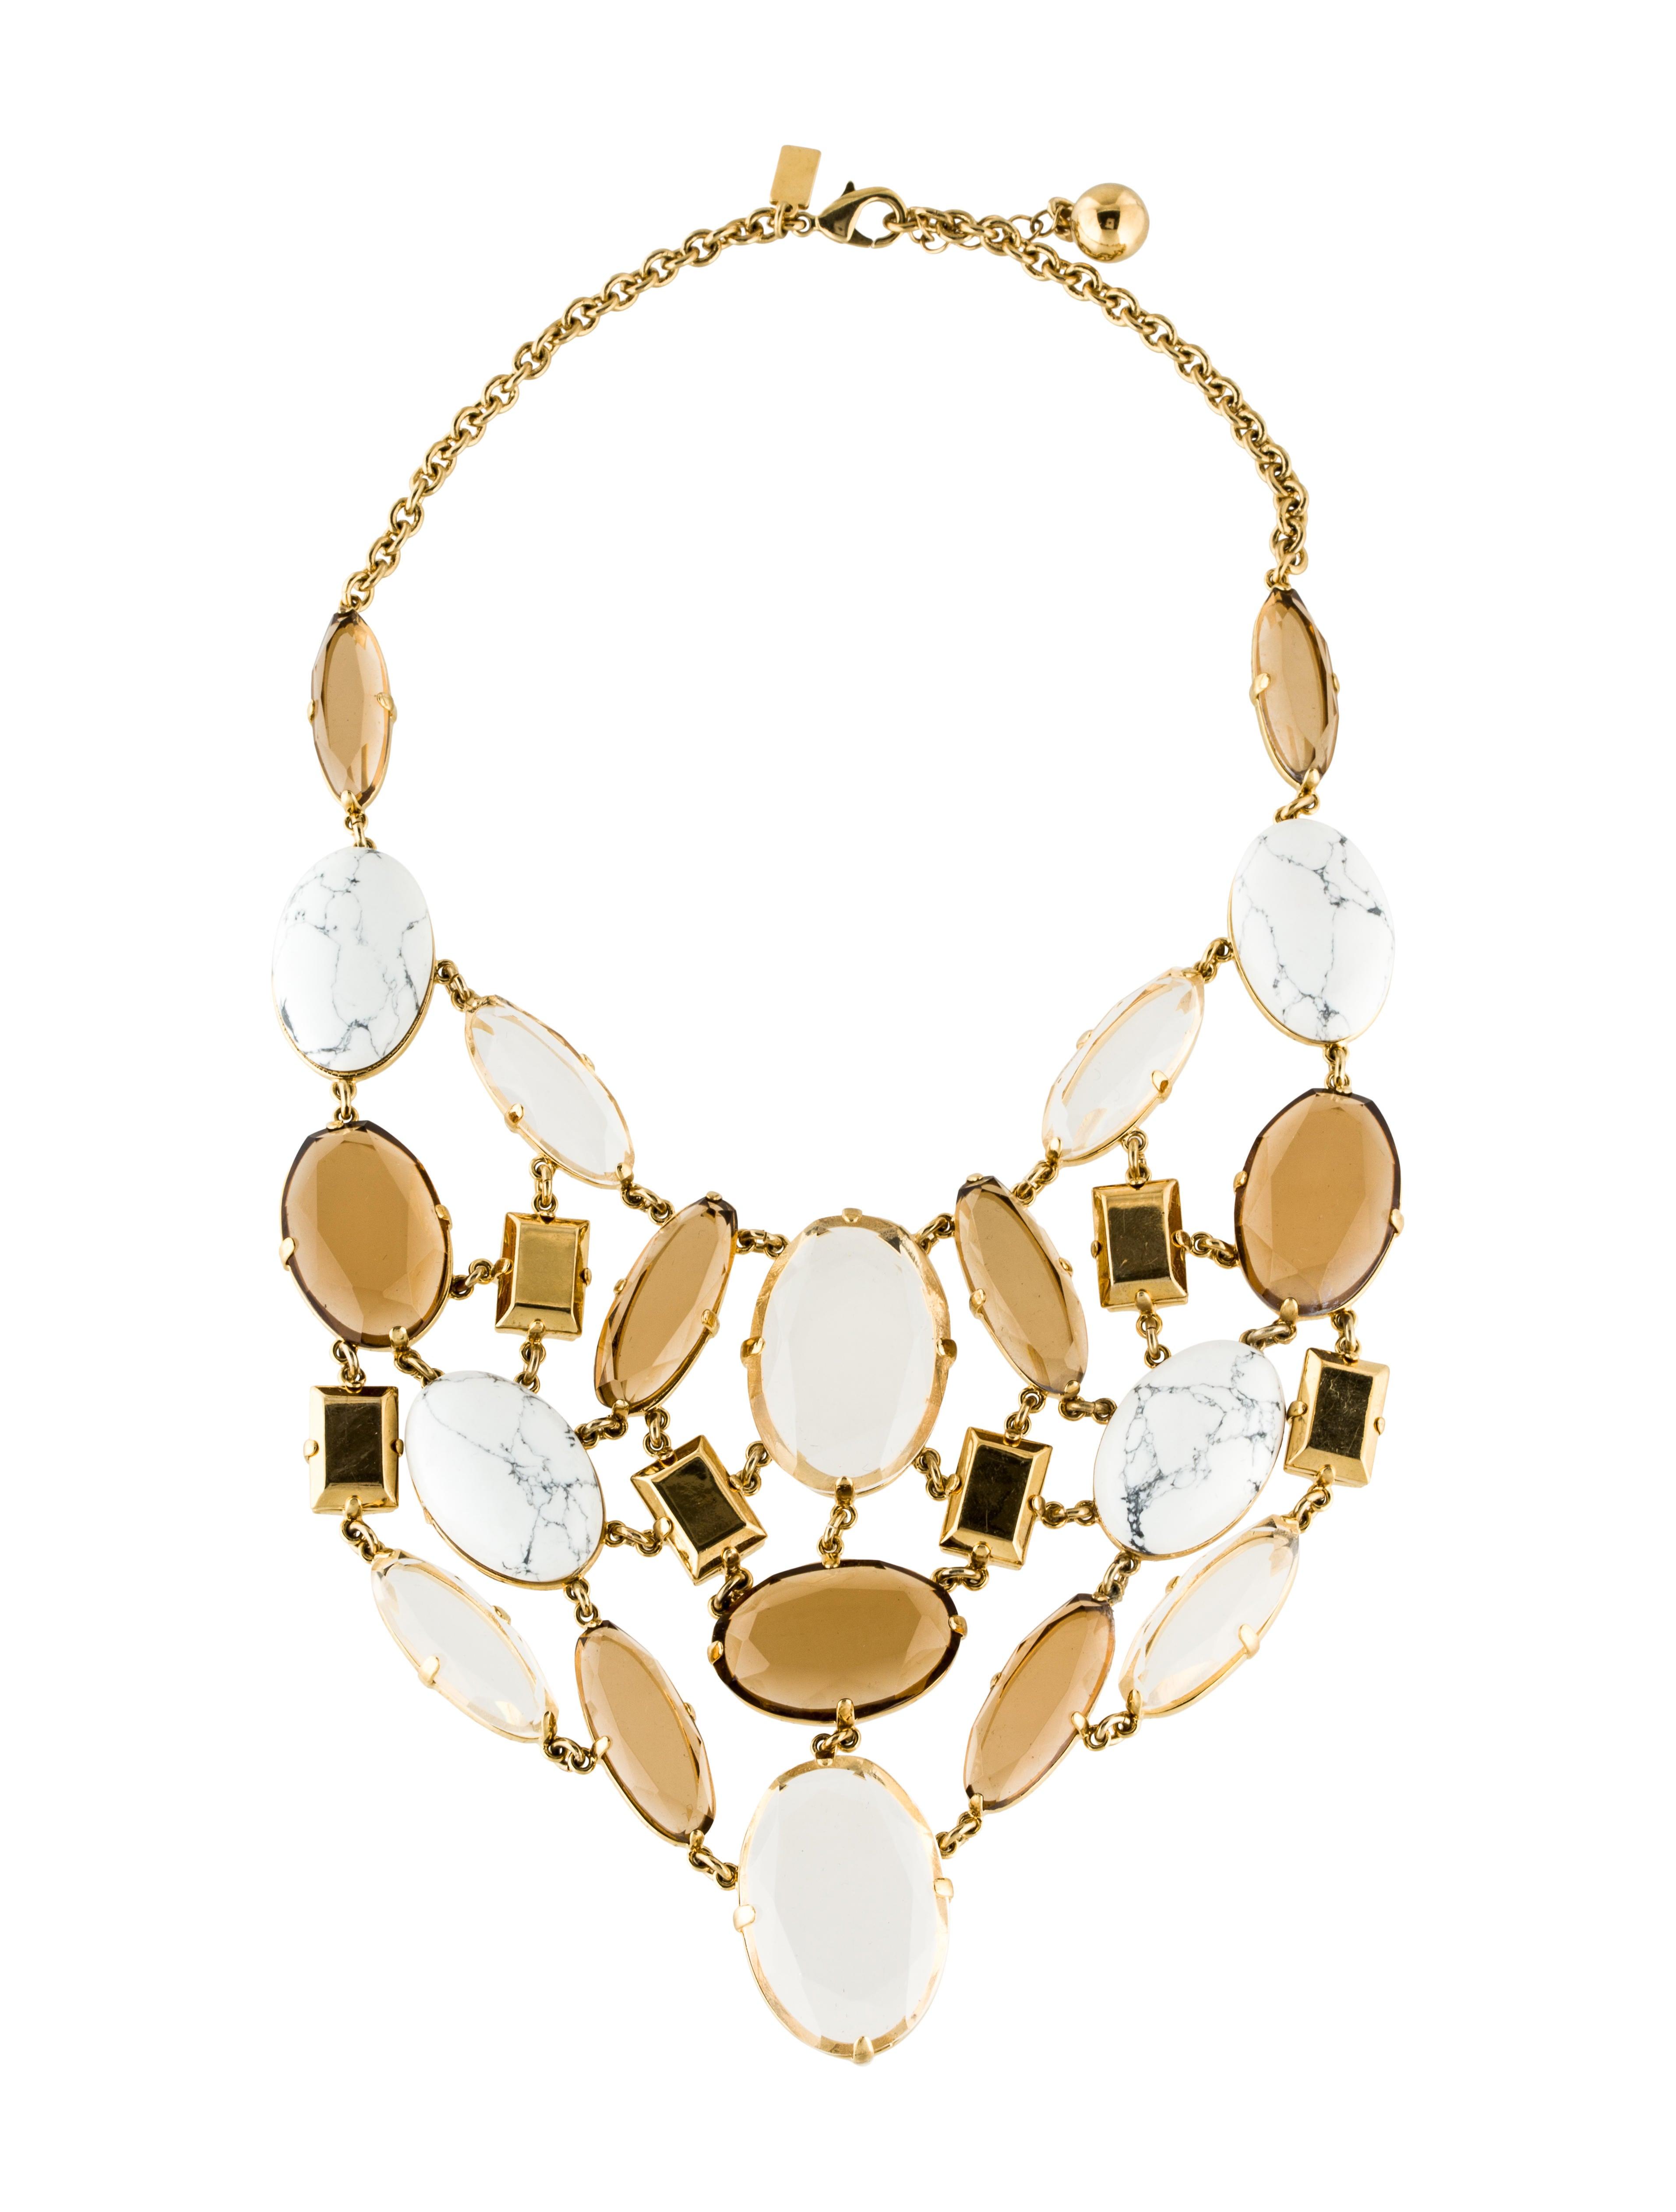 kate spade new york statement necklace necklaces. Black Bedroom Furniture Sets. Home Design Ideas